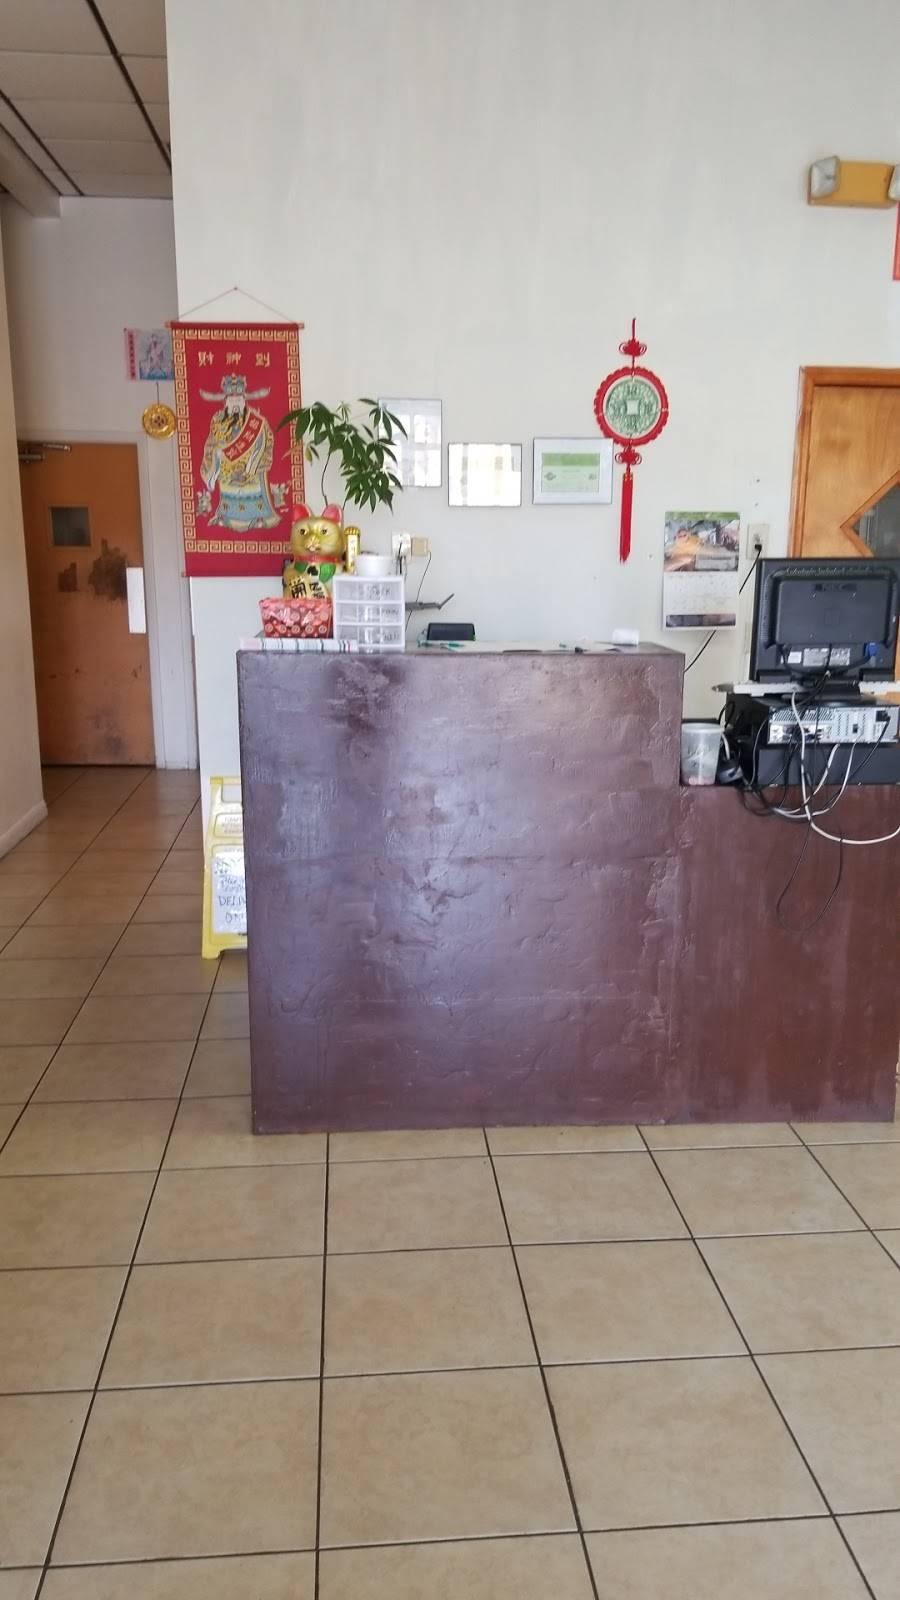 New China Beach Restaurant   restaurant   6170 Ulmerton Rd #14, Clearwater, FL 33760, USA   7275307785 OR +1 727-530-7785